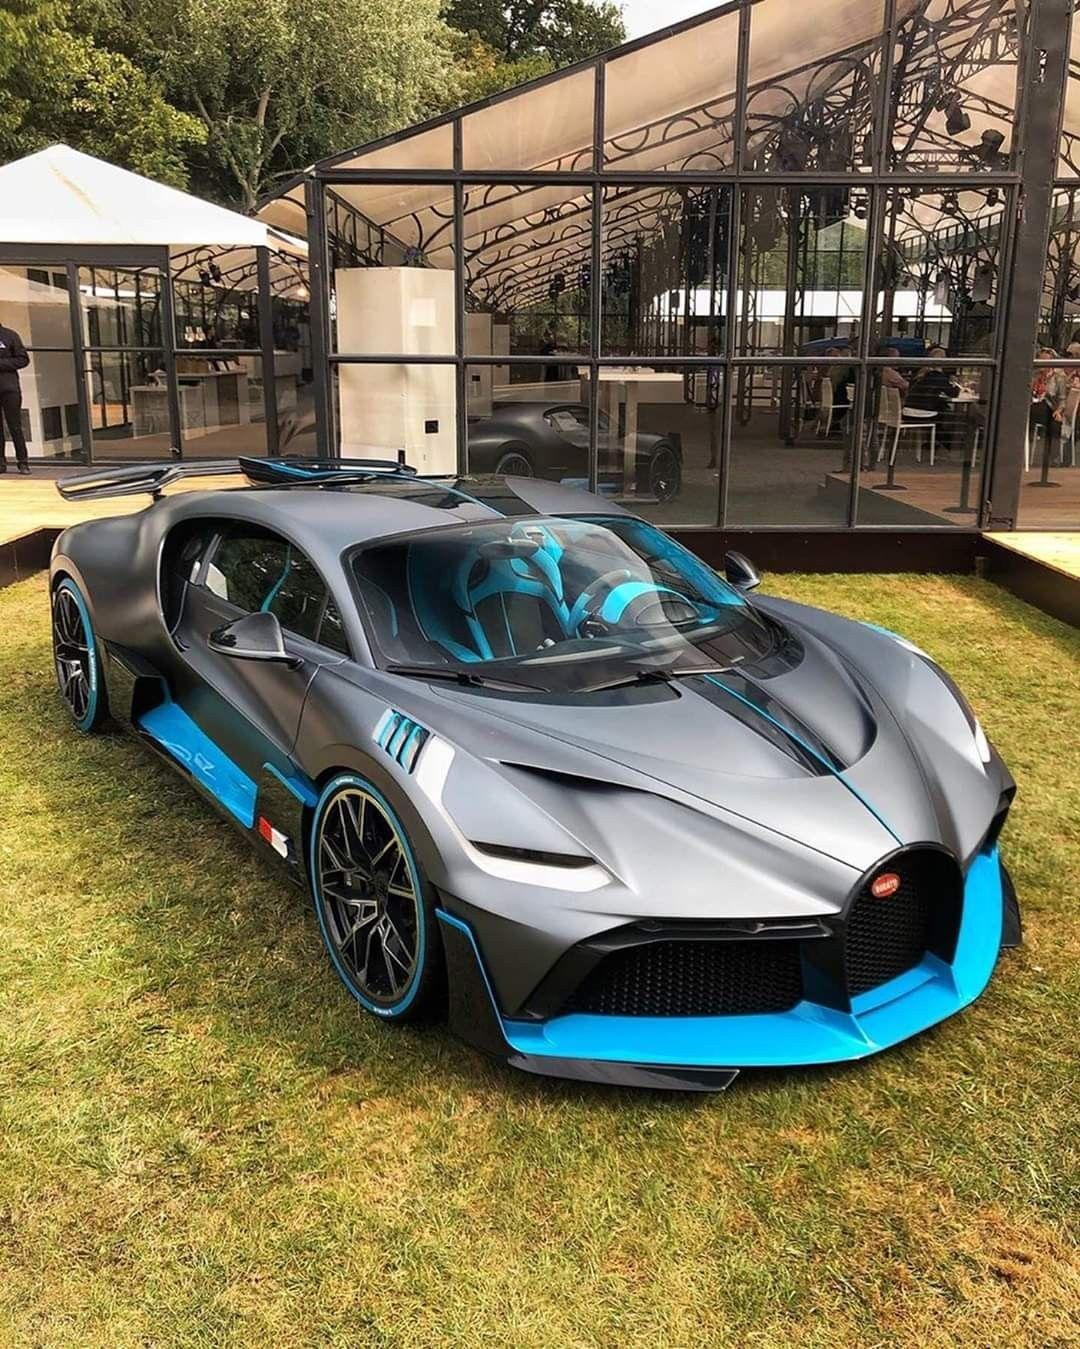 Pin De Superion Solace En Cars En 2020 Carros De Lujo Coches De